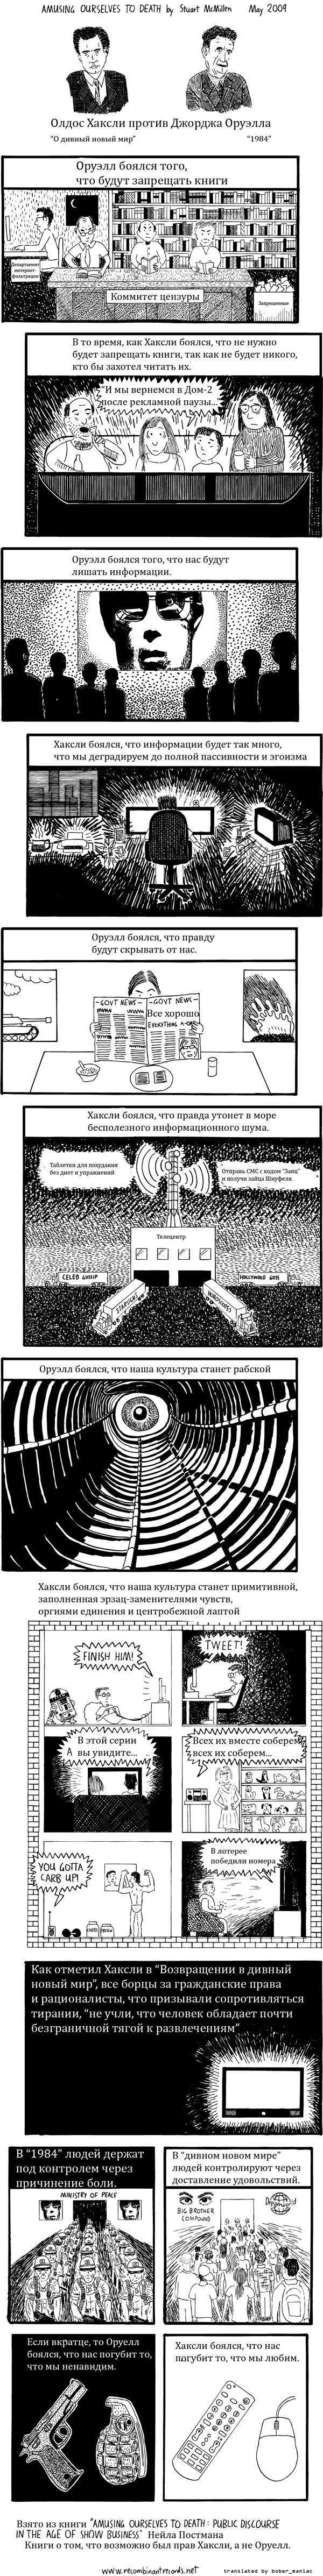 комикс Хаксли vs Оруэлл